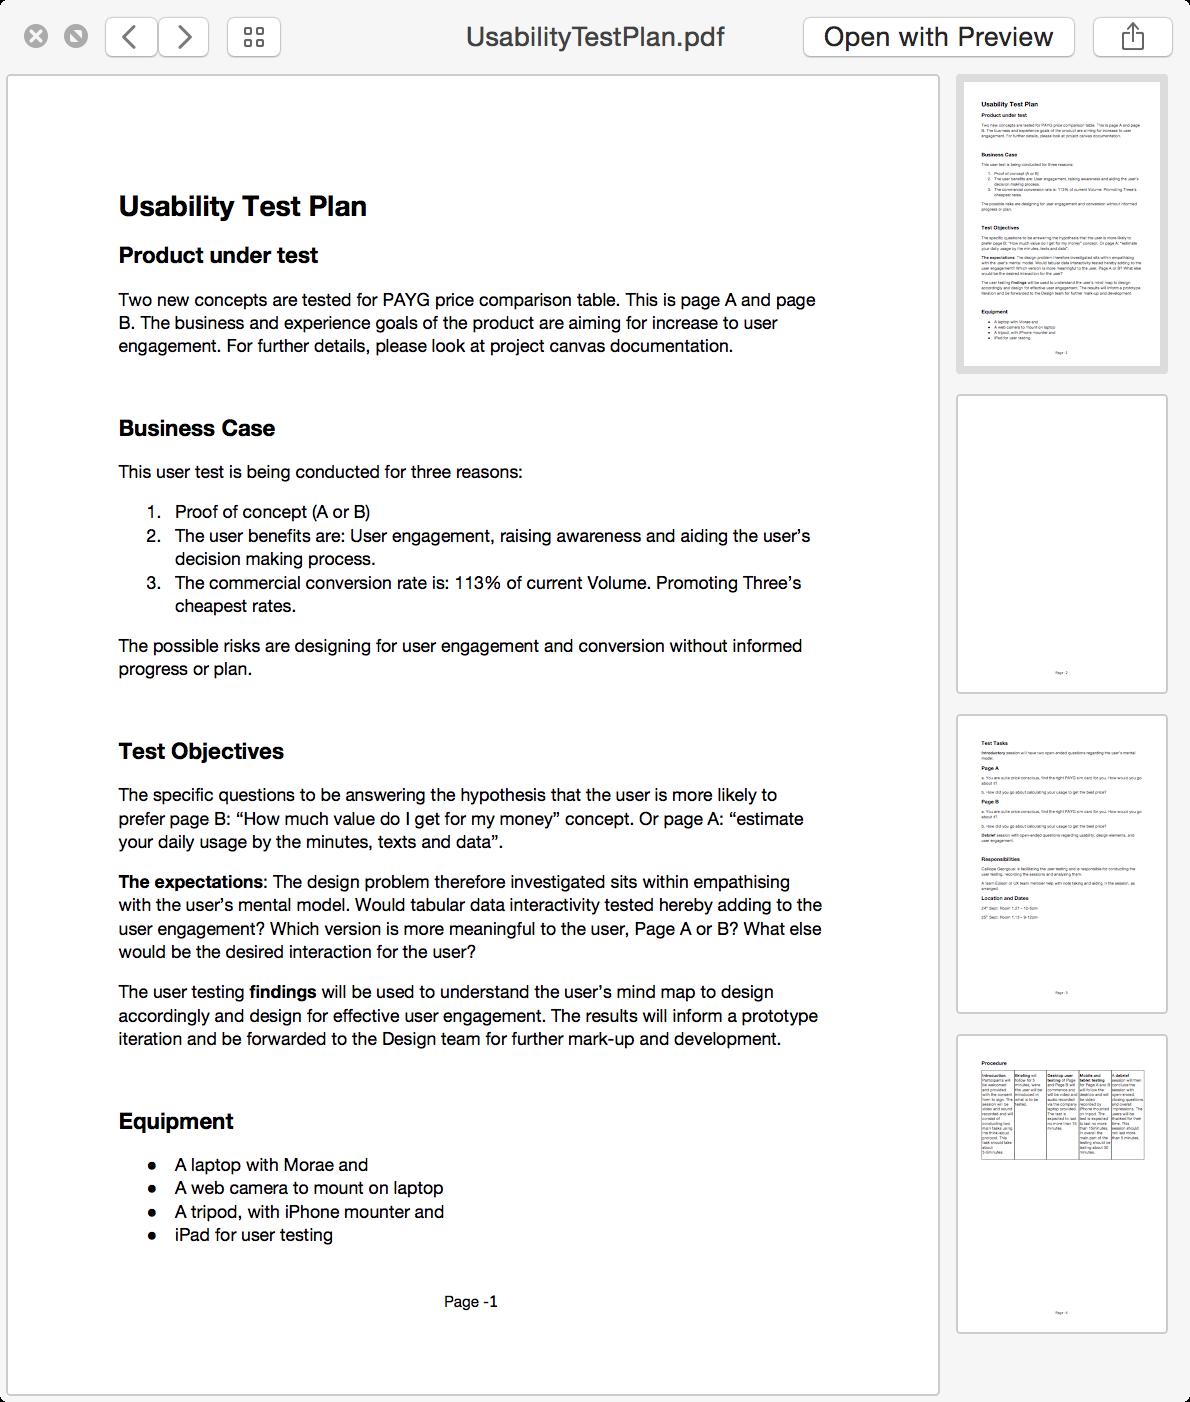 usability testing plan.png